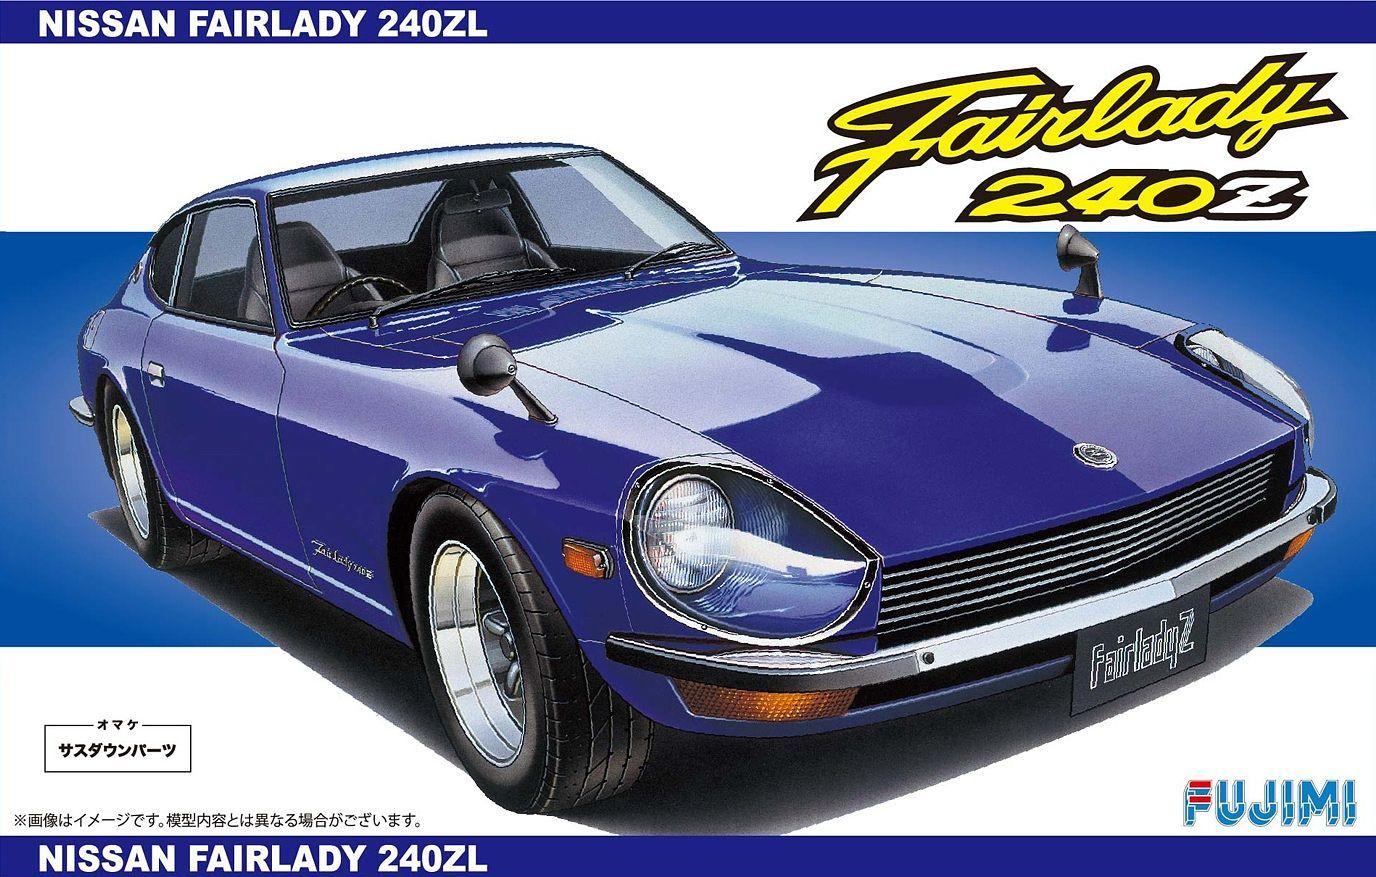 Fujimi FAIRLADY 240ZL